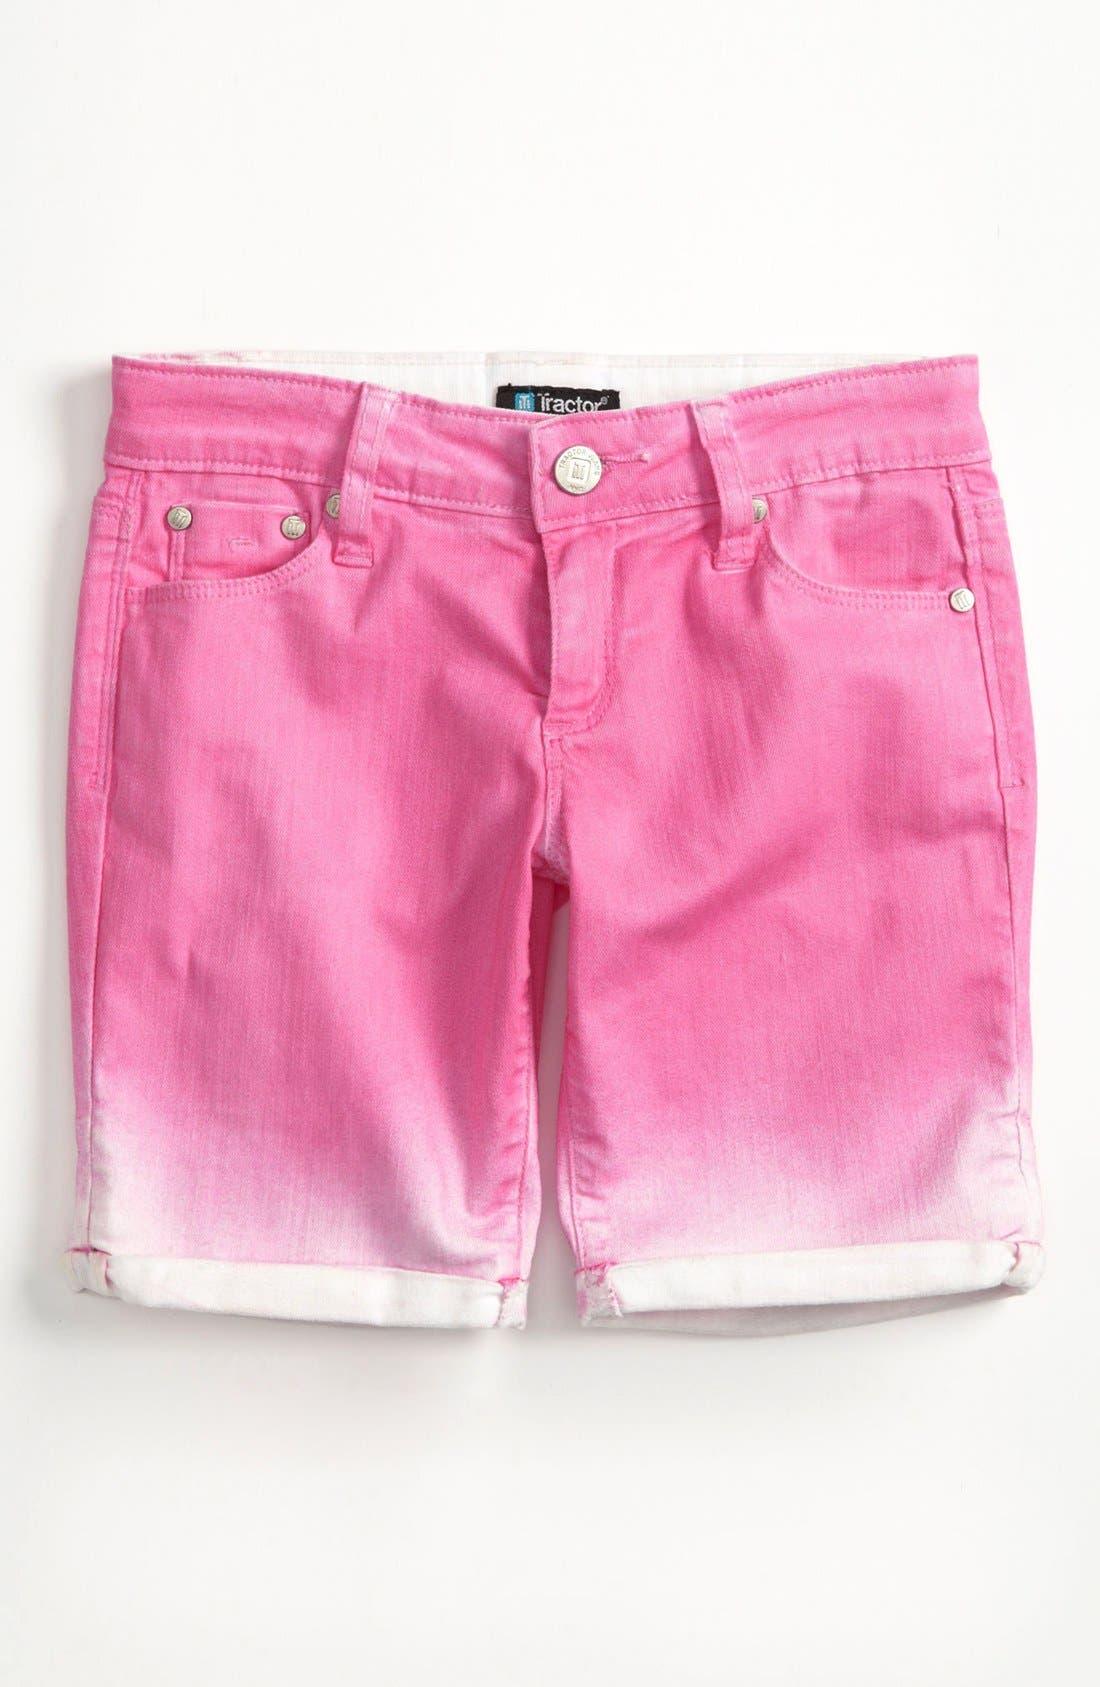 Alternate Image 1 Selected - Tractr Ombré Bermuda Shorts (Big Girls)